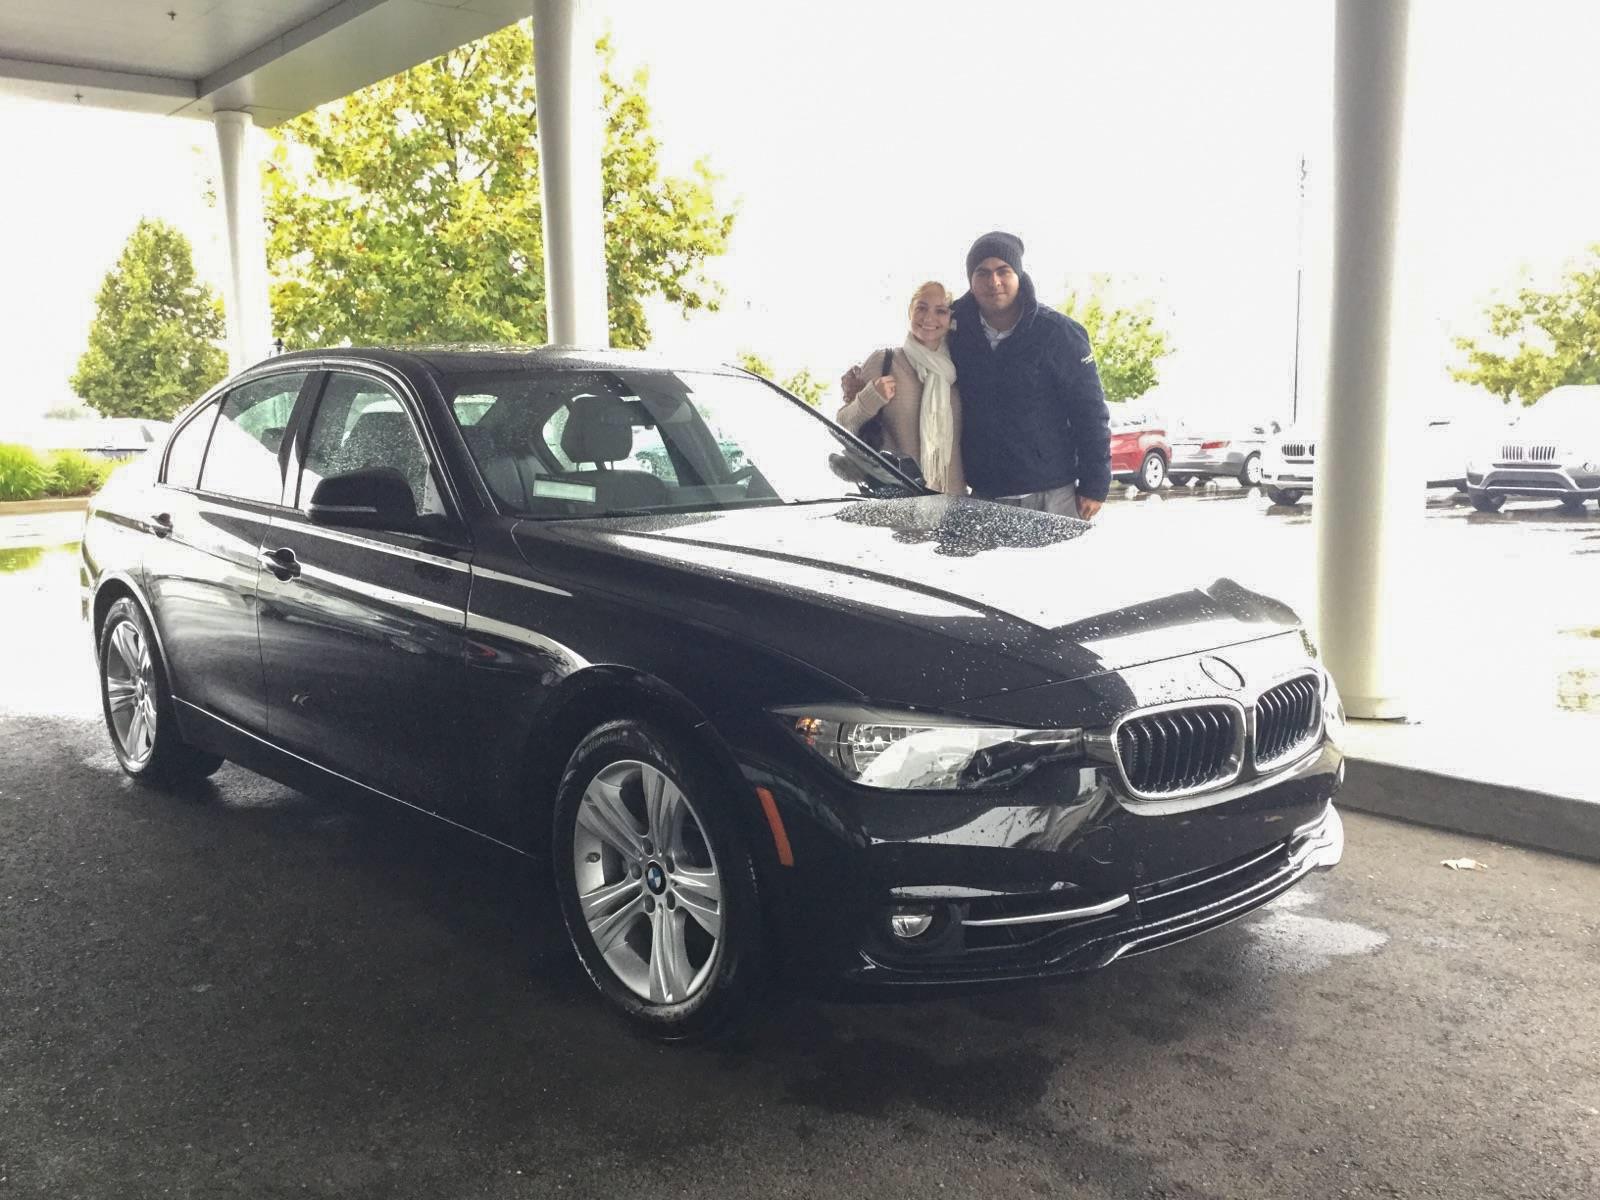 Niello BMW Elk Grove review